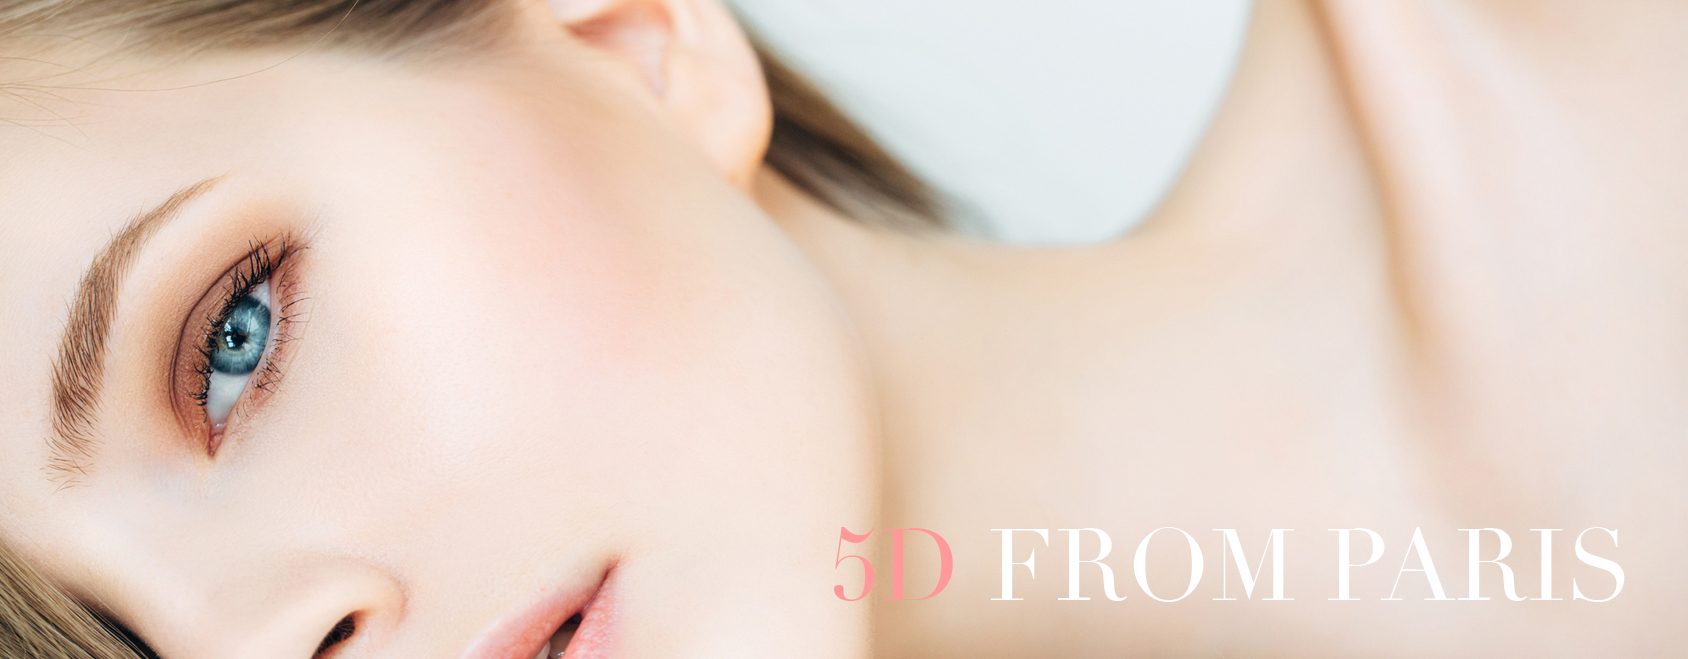 5df.jpg